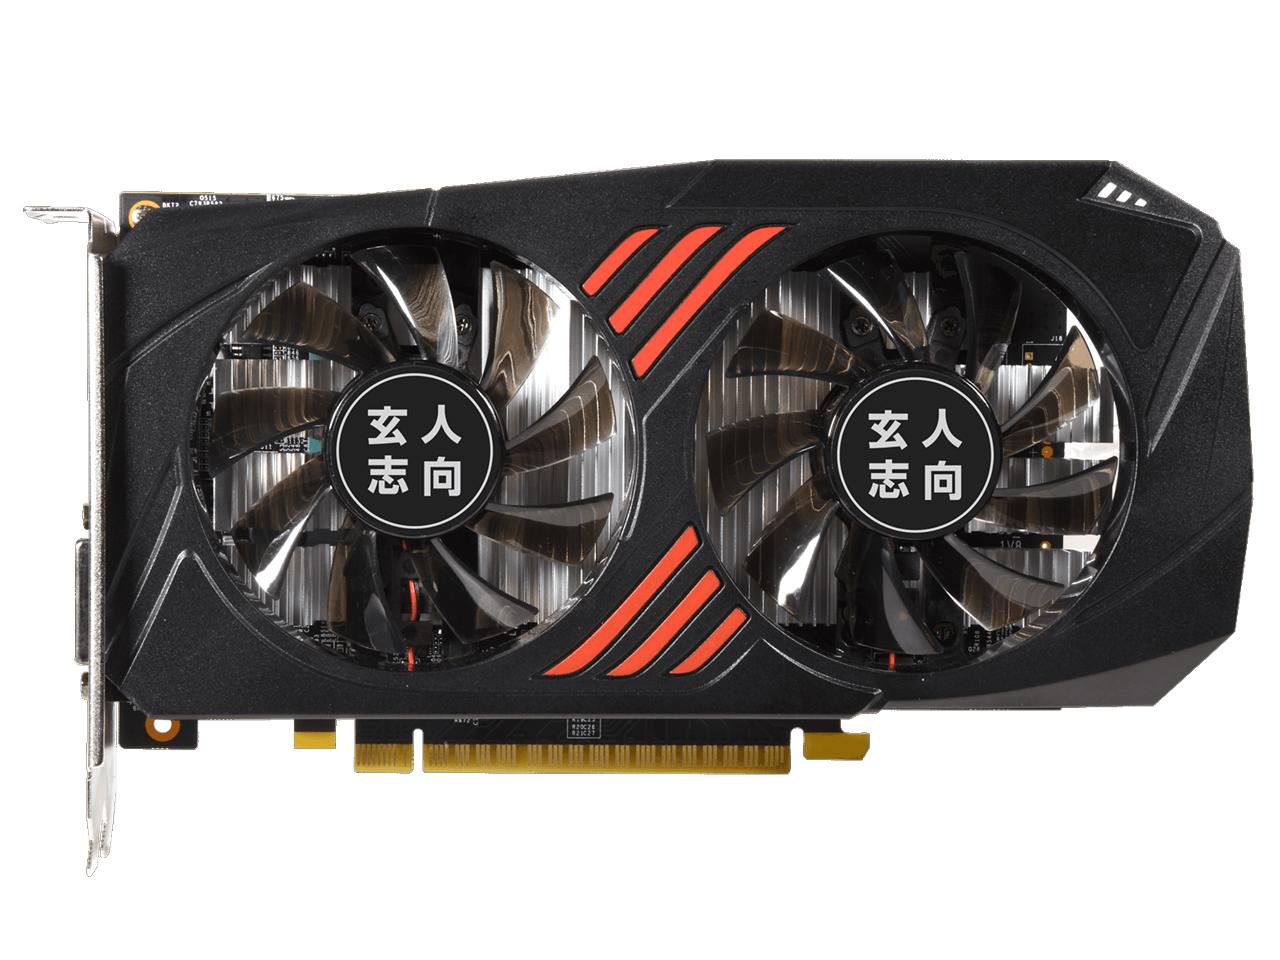 『本体1』 GF-GTX1060-E6GB/GD5X/FIN [PCIExp 6GB] の製品画像